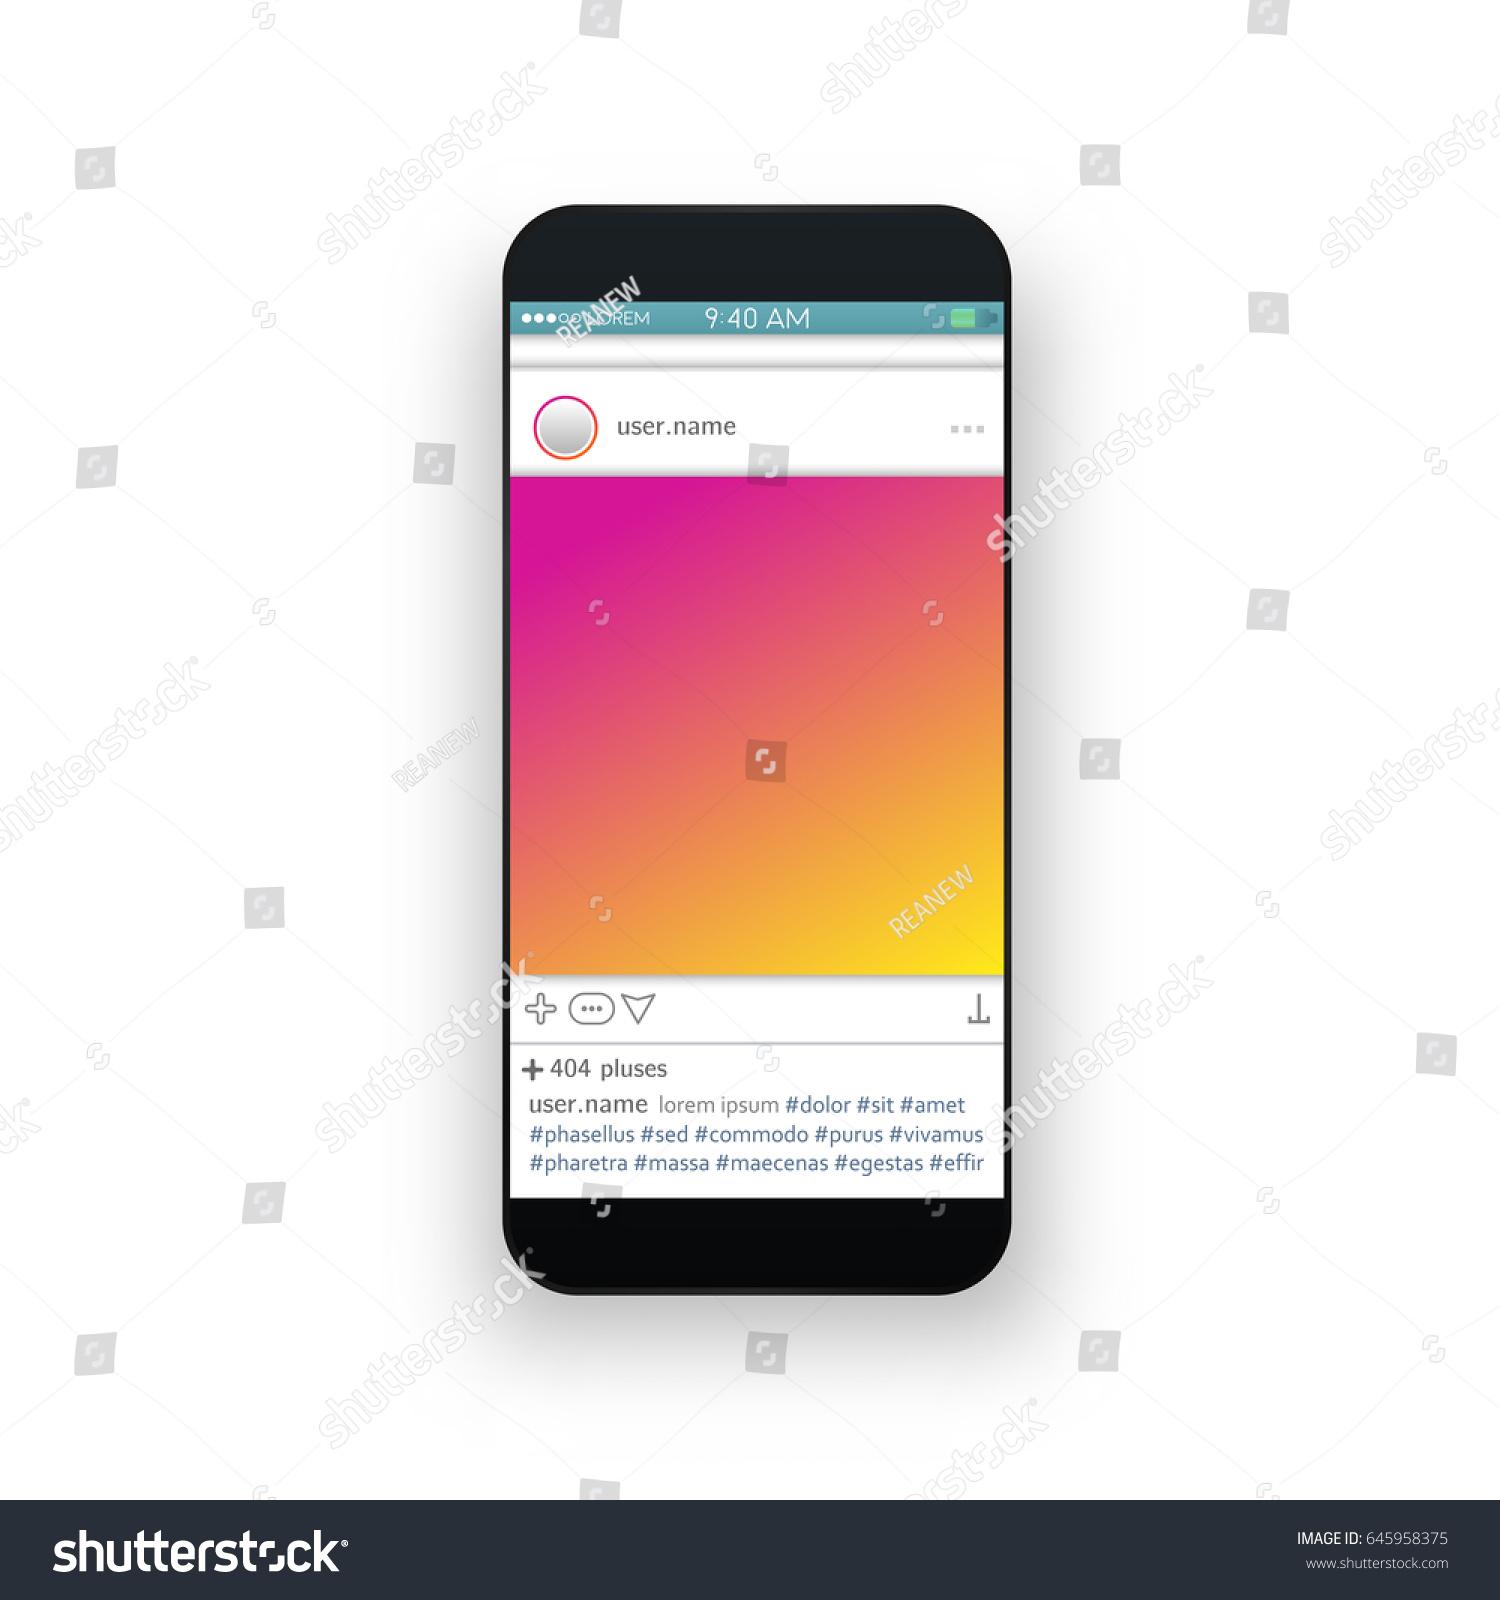 Vector Illustration Instagram: Social Network Instagram Photo Frame Vector Stock Vector